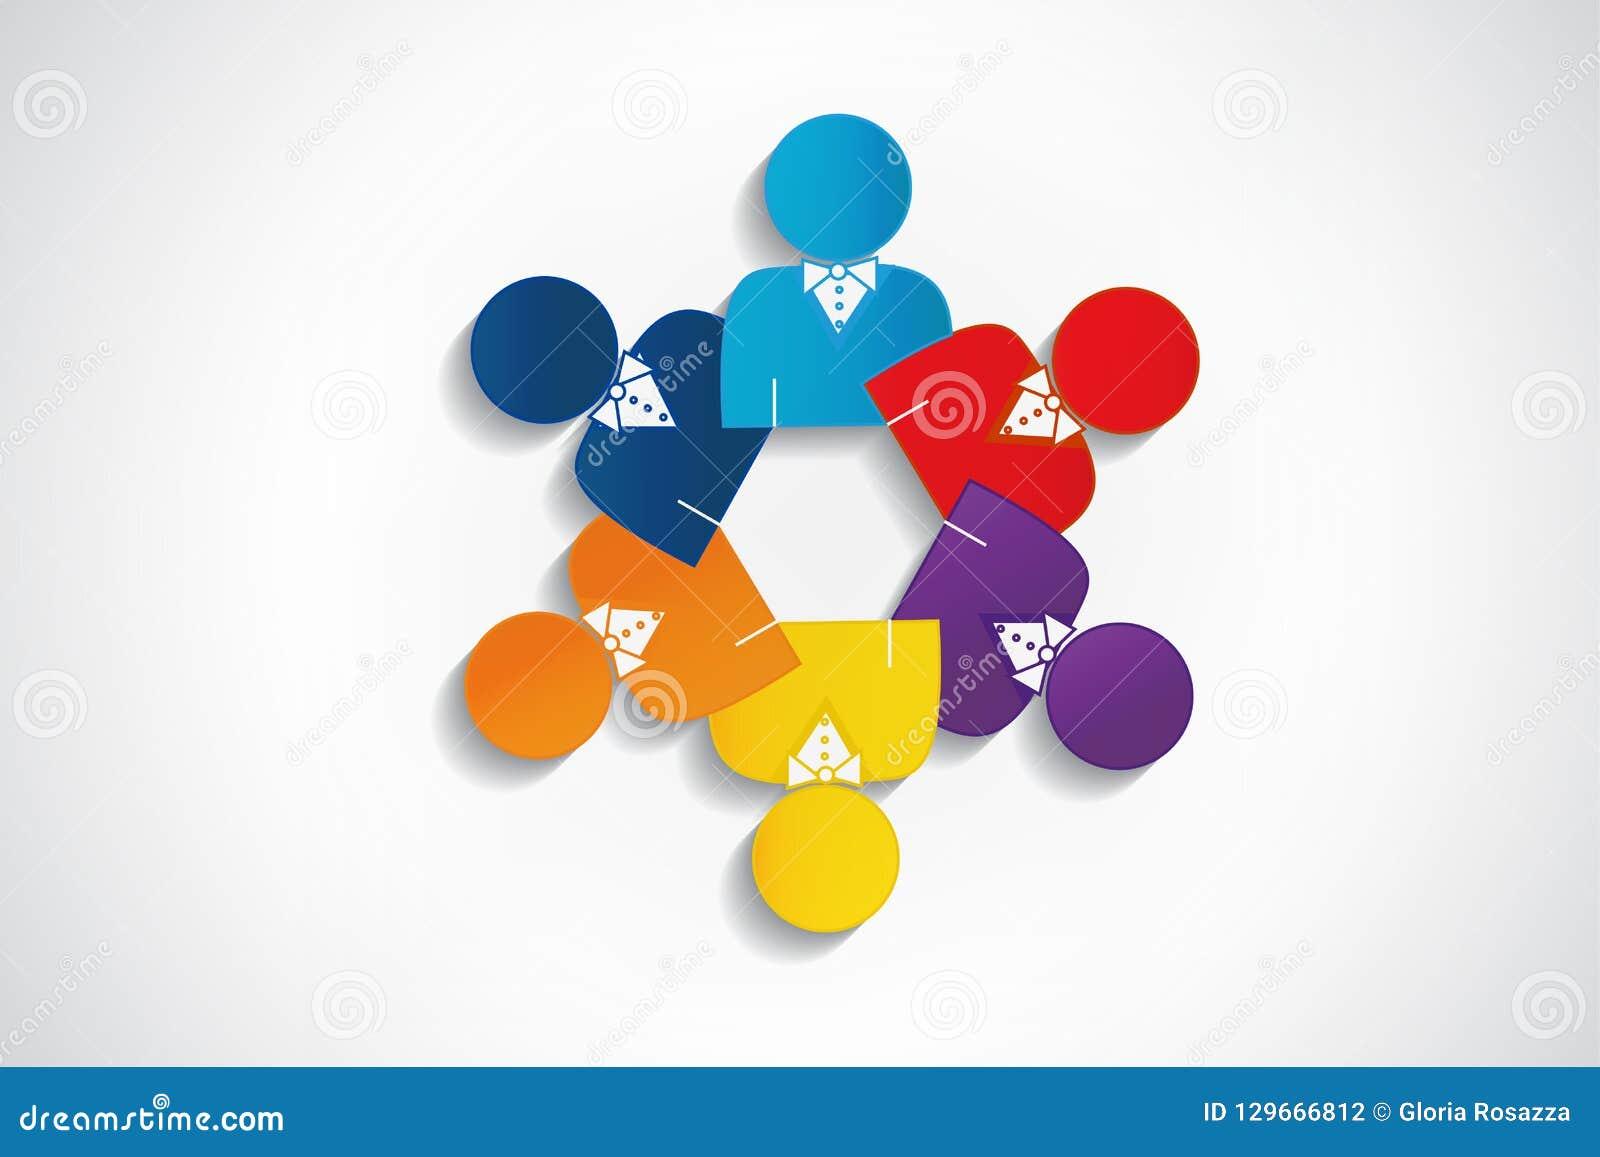 Logo Teamwork Manager Meeting People Design Stock Vector Illustration Of Community Embraced 129666812